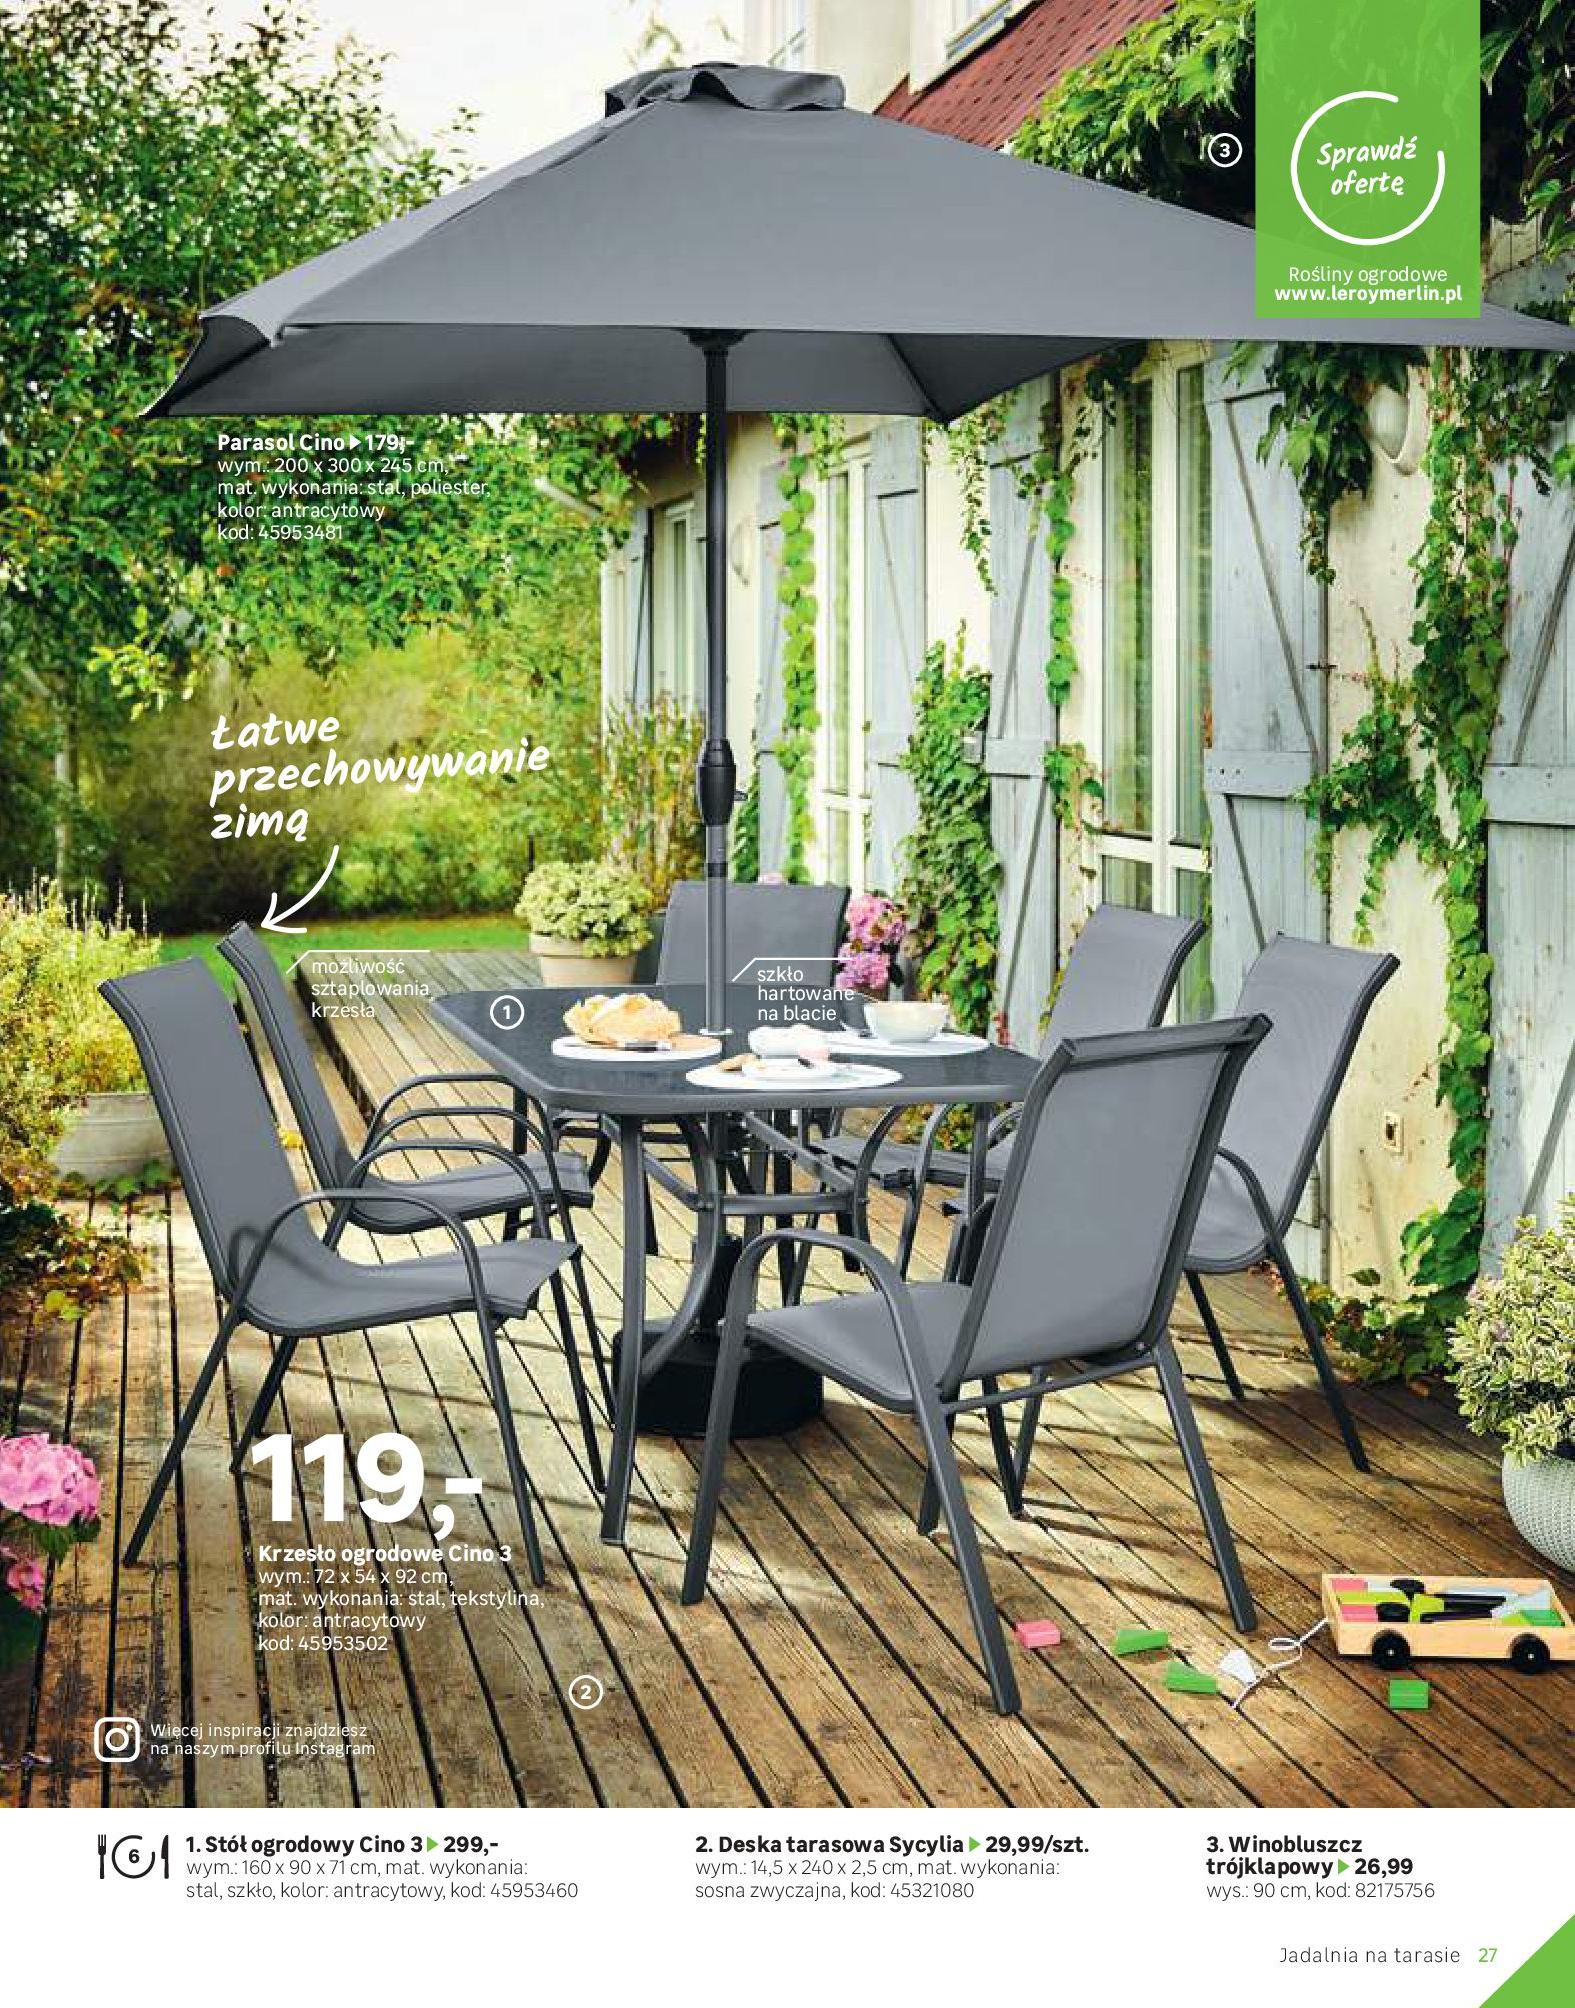 Gazetka Leroy Merlin: Katalog Ogród 2021-03-10 page-27